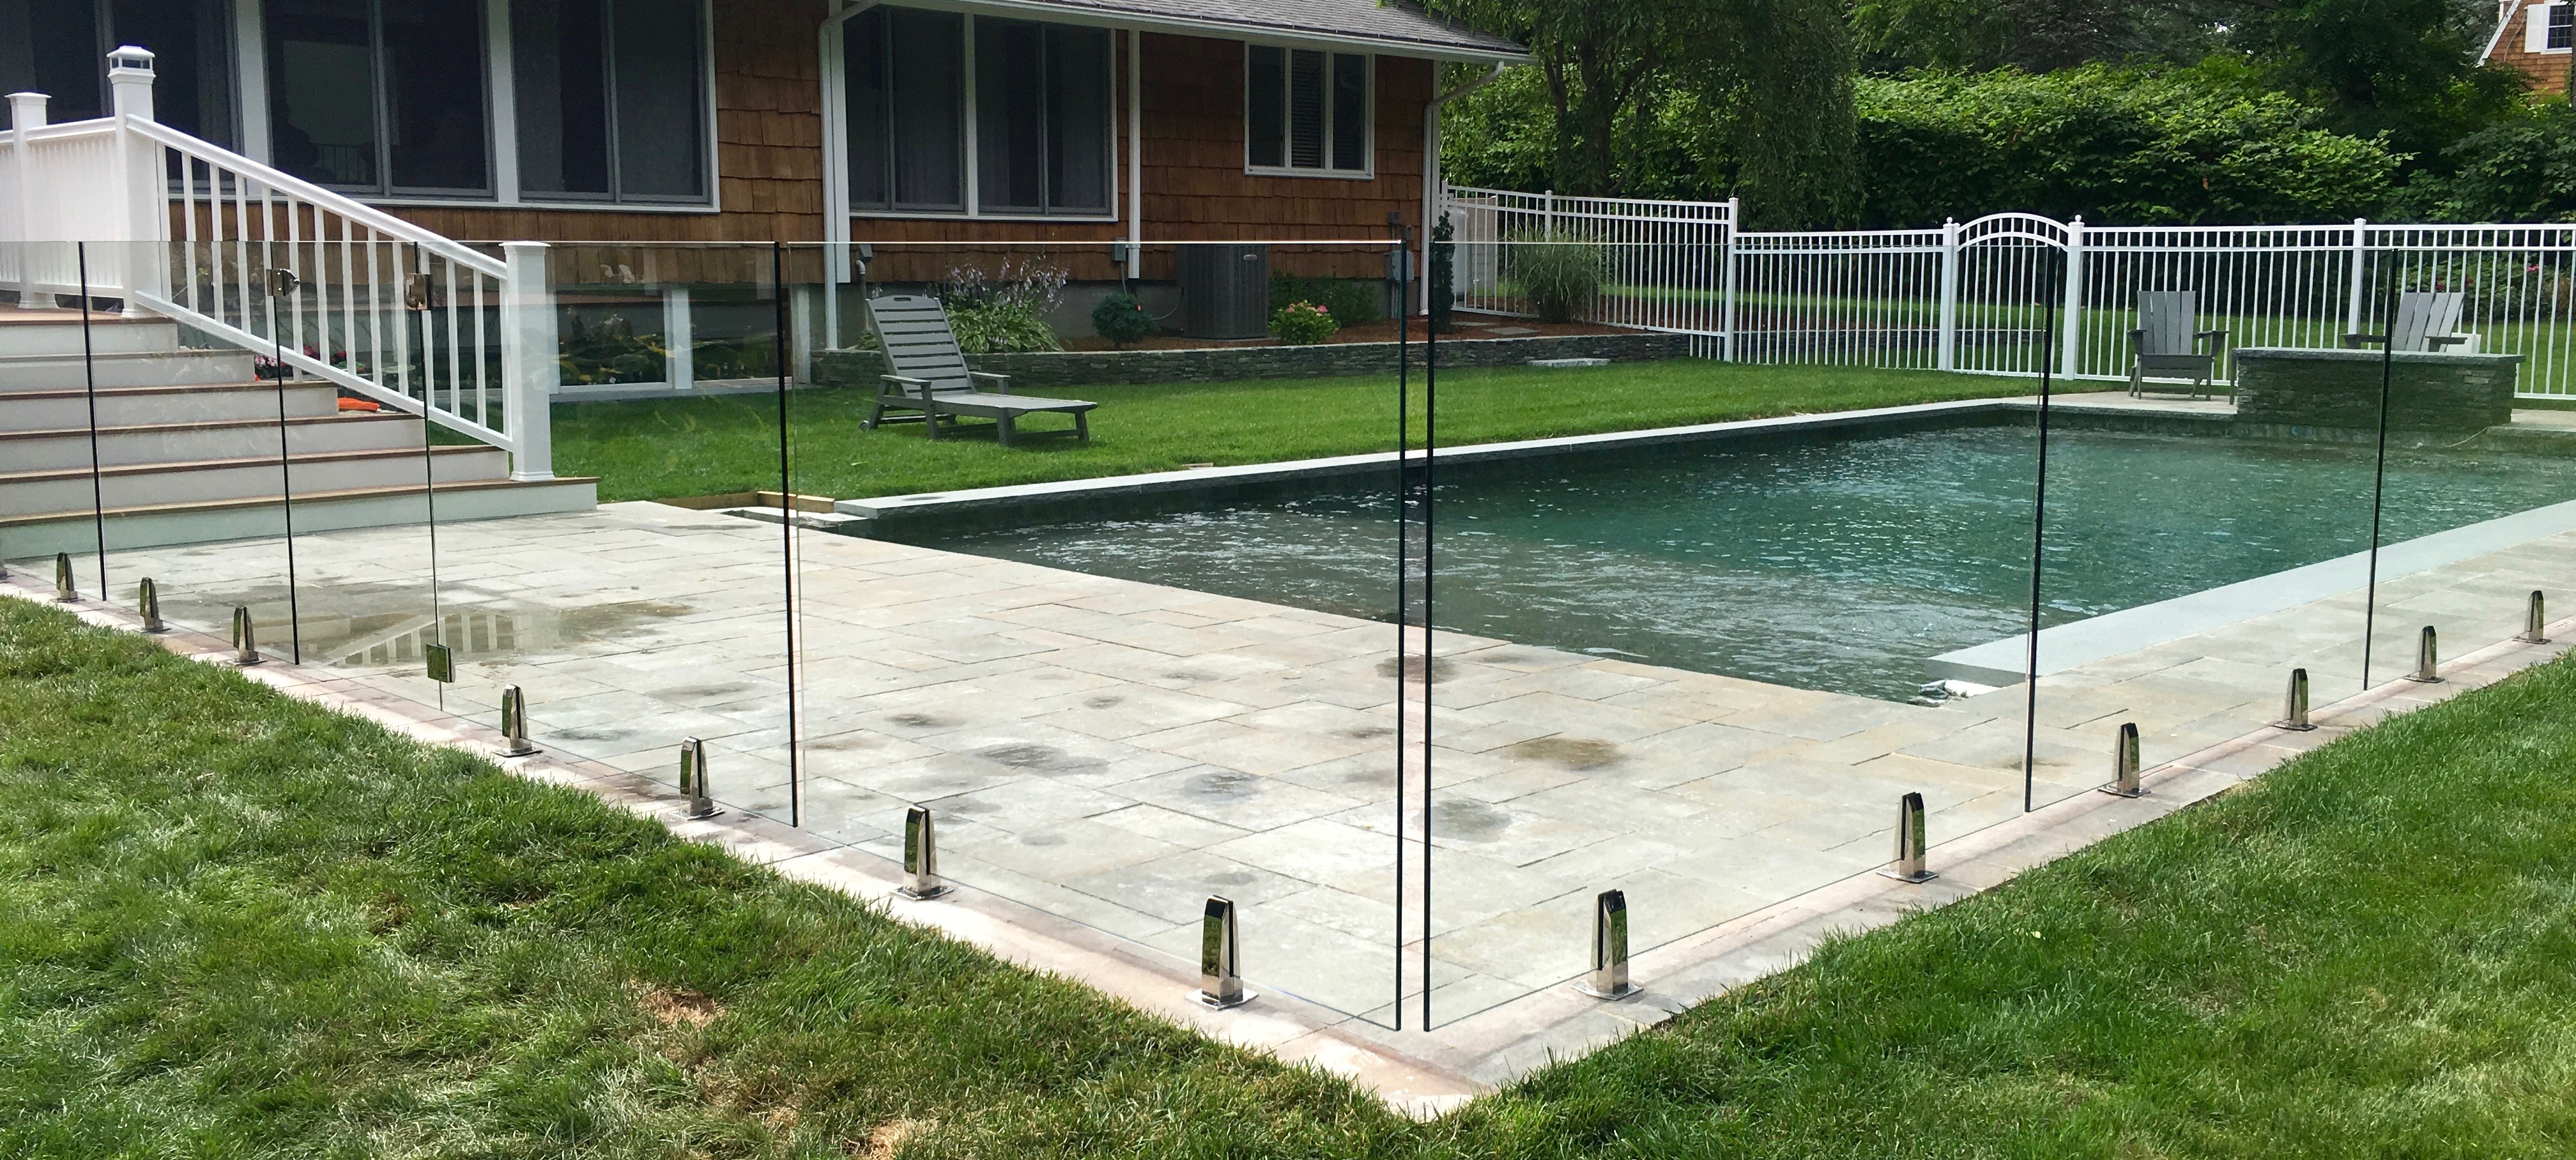 Frameless Glass Pool Fence 2 Pool Repairs Perth Wa